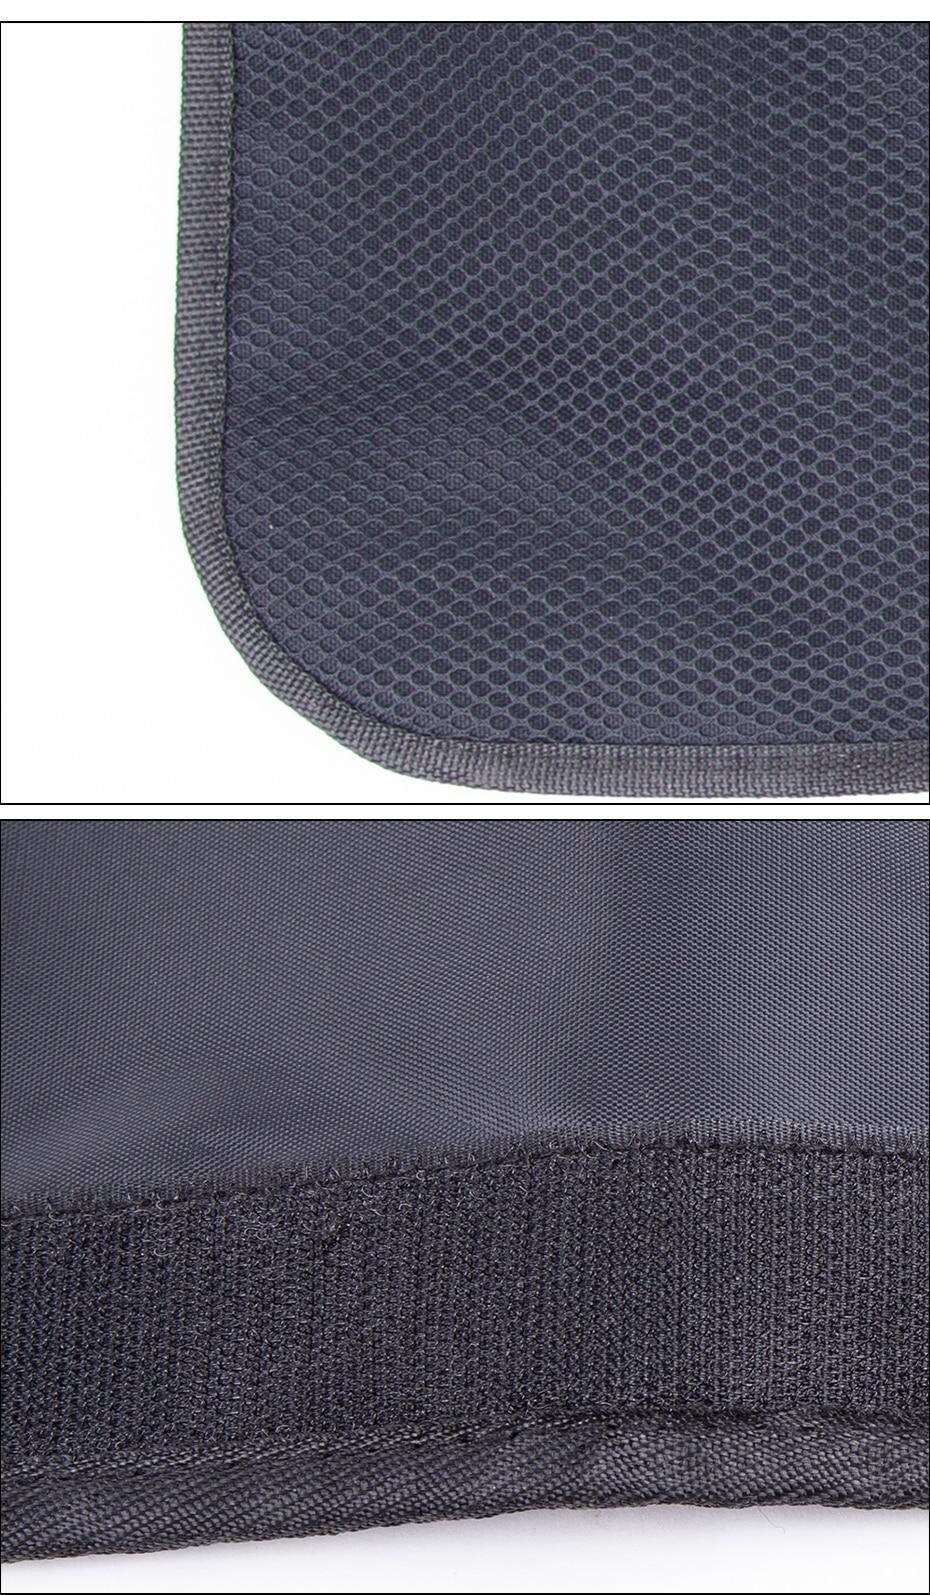 Car-Trunk-Organizer-Bag-01.detail_04